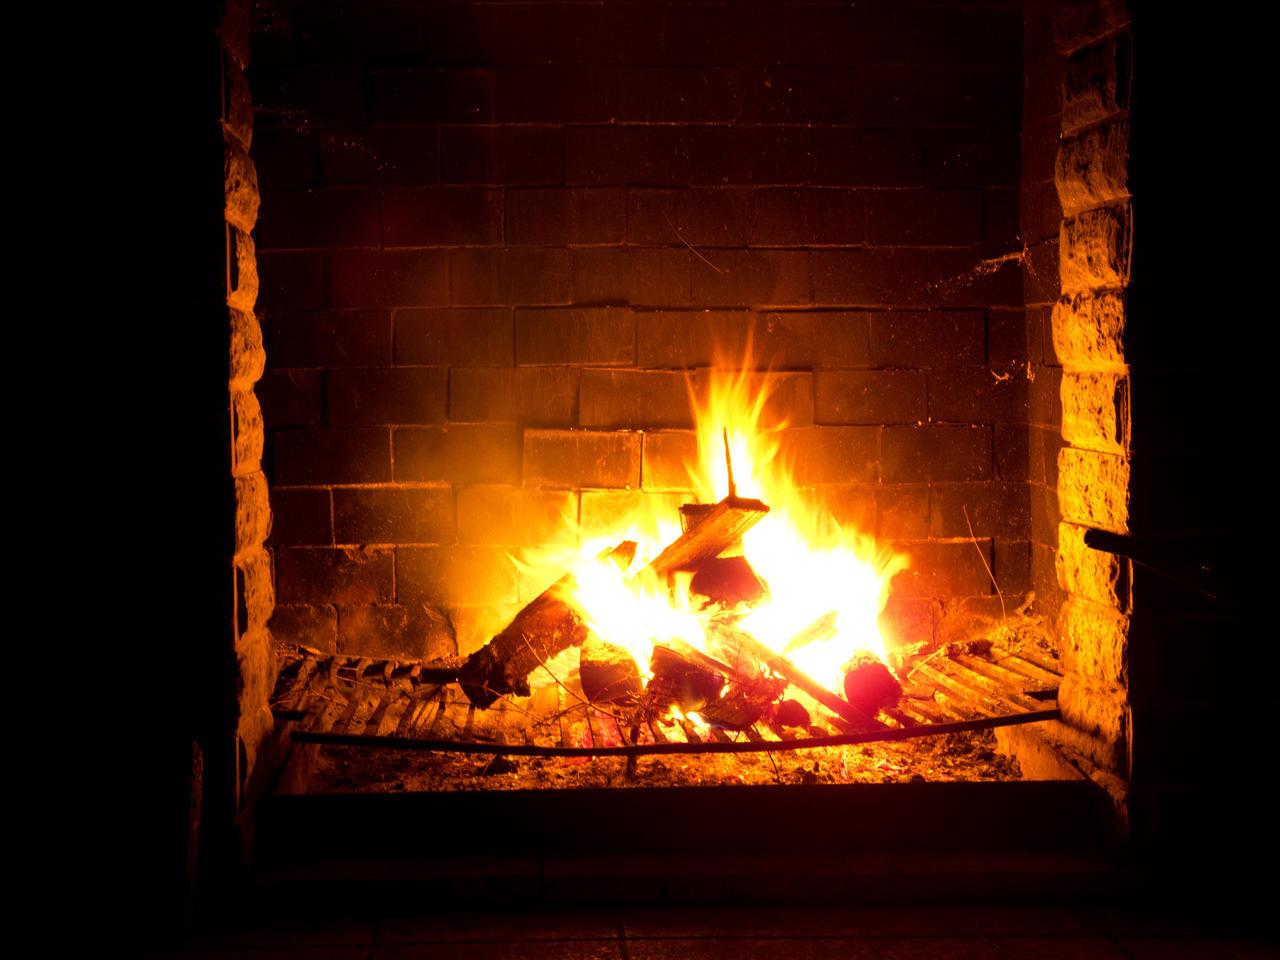 fire, fireplace by basquiat79 on DeviantArt